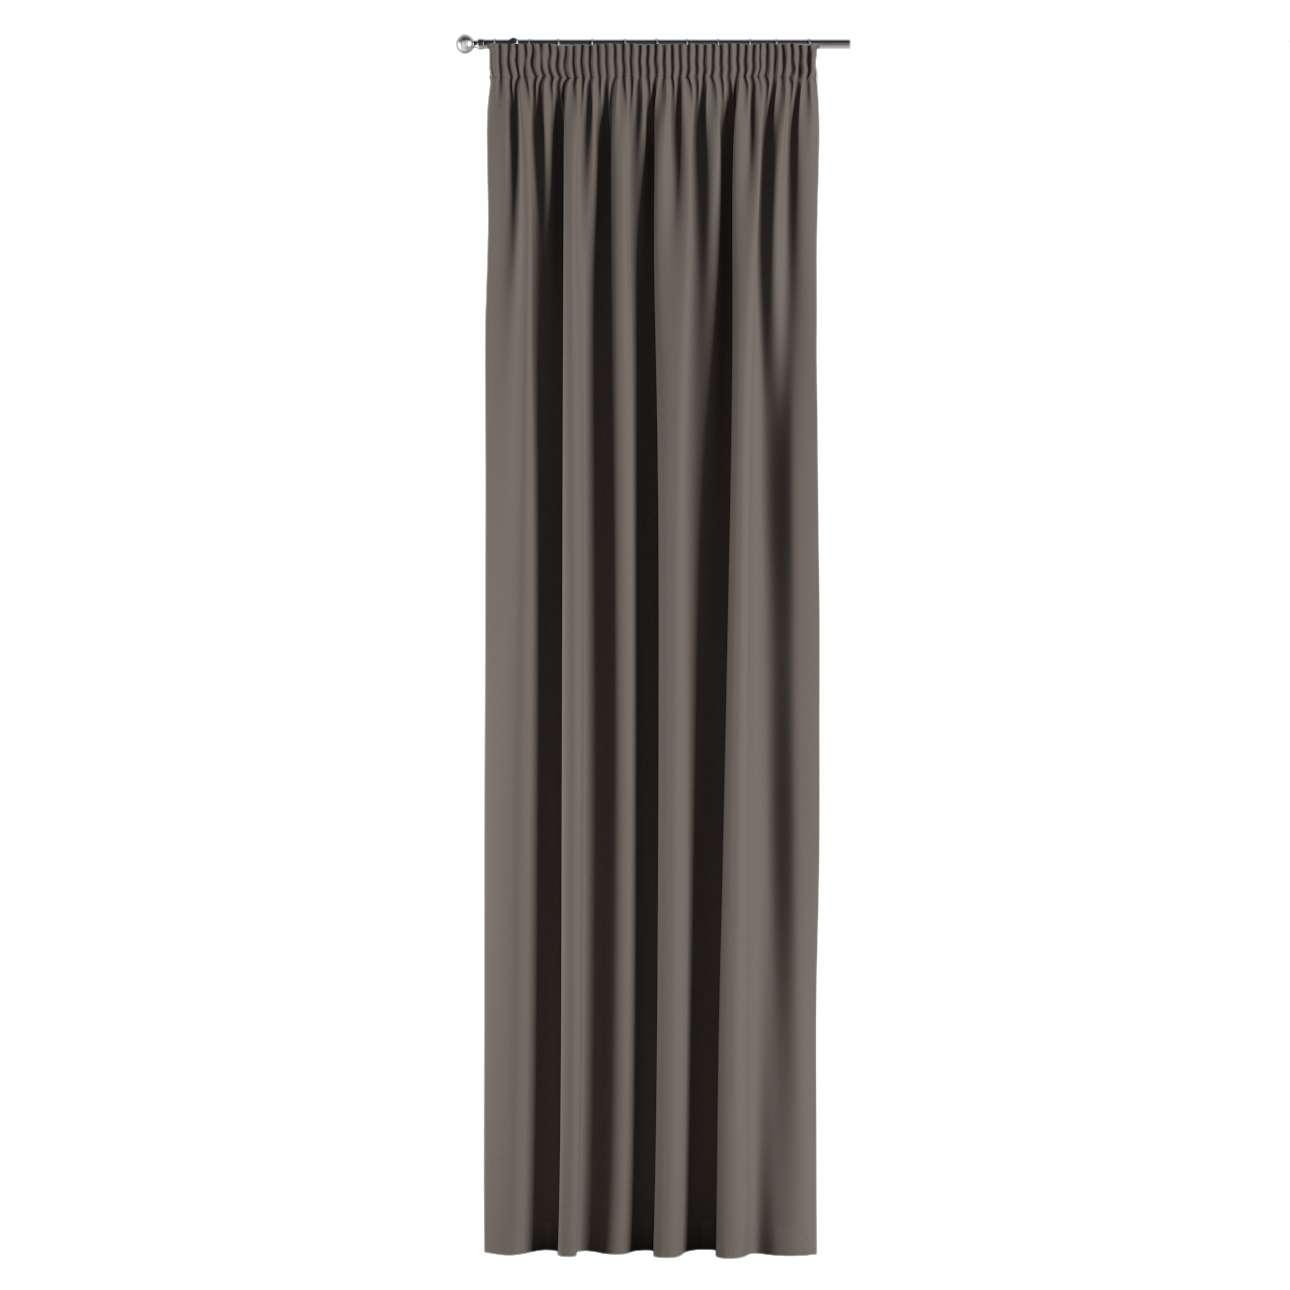 verdunklungsvorhang mit kr uselband braun dekoria. Black Bedroom Furniture Sets. Home Design Ideas